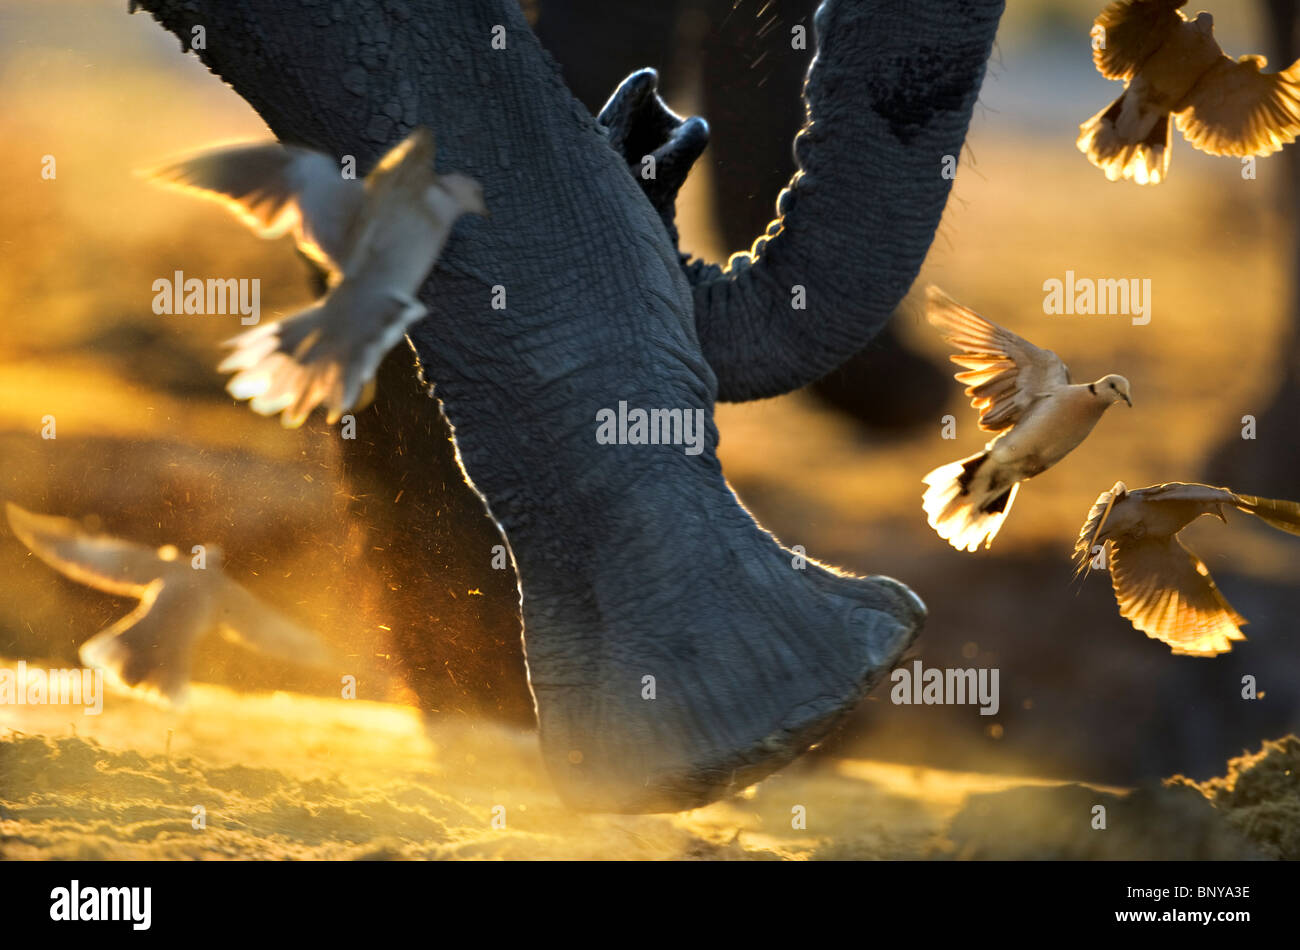 Nahaufnahme des Elefanten Füße der Cape Turteltauben zu stören. Savuti, Botswana. Stockbild